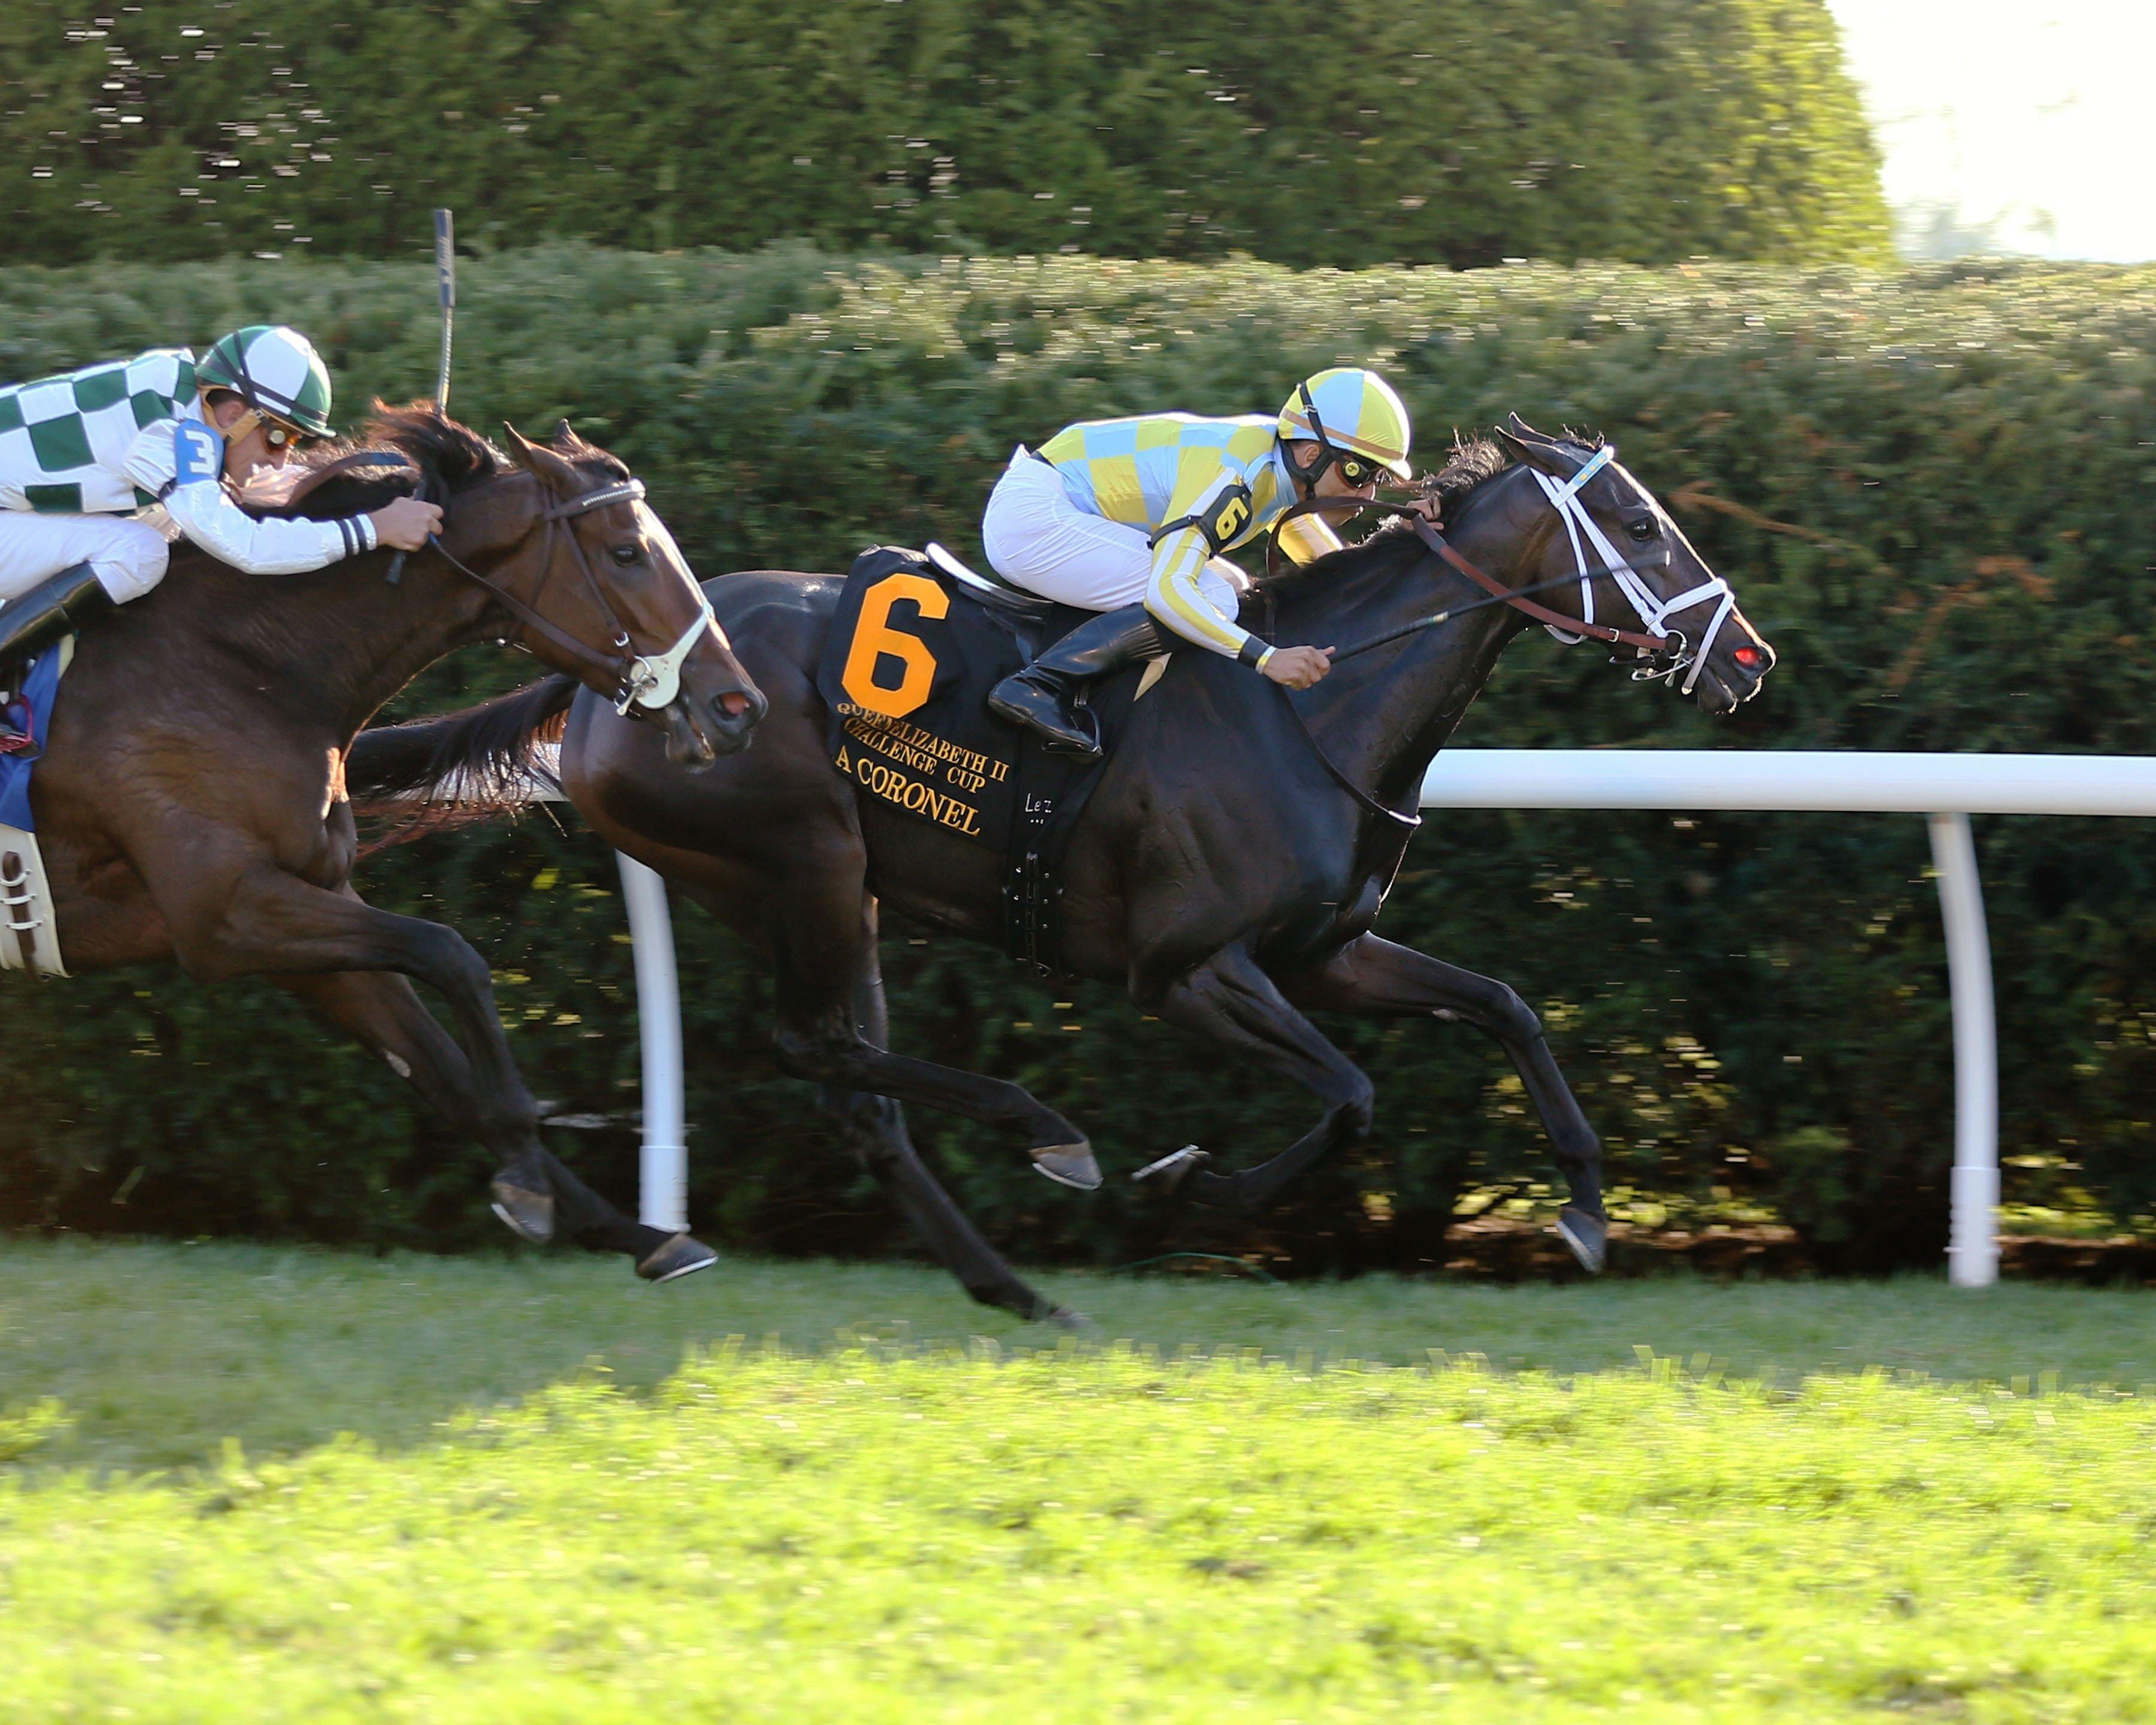 La Coronel stays ideal at Keeneland in QEII Challenge